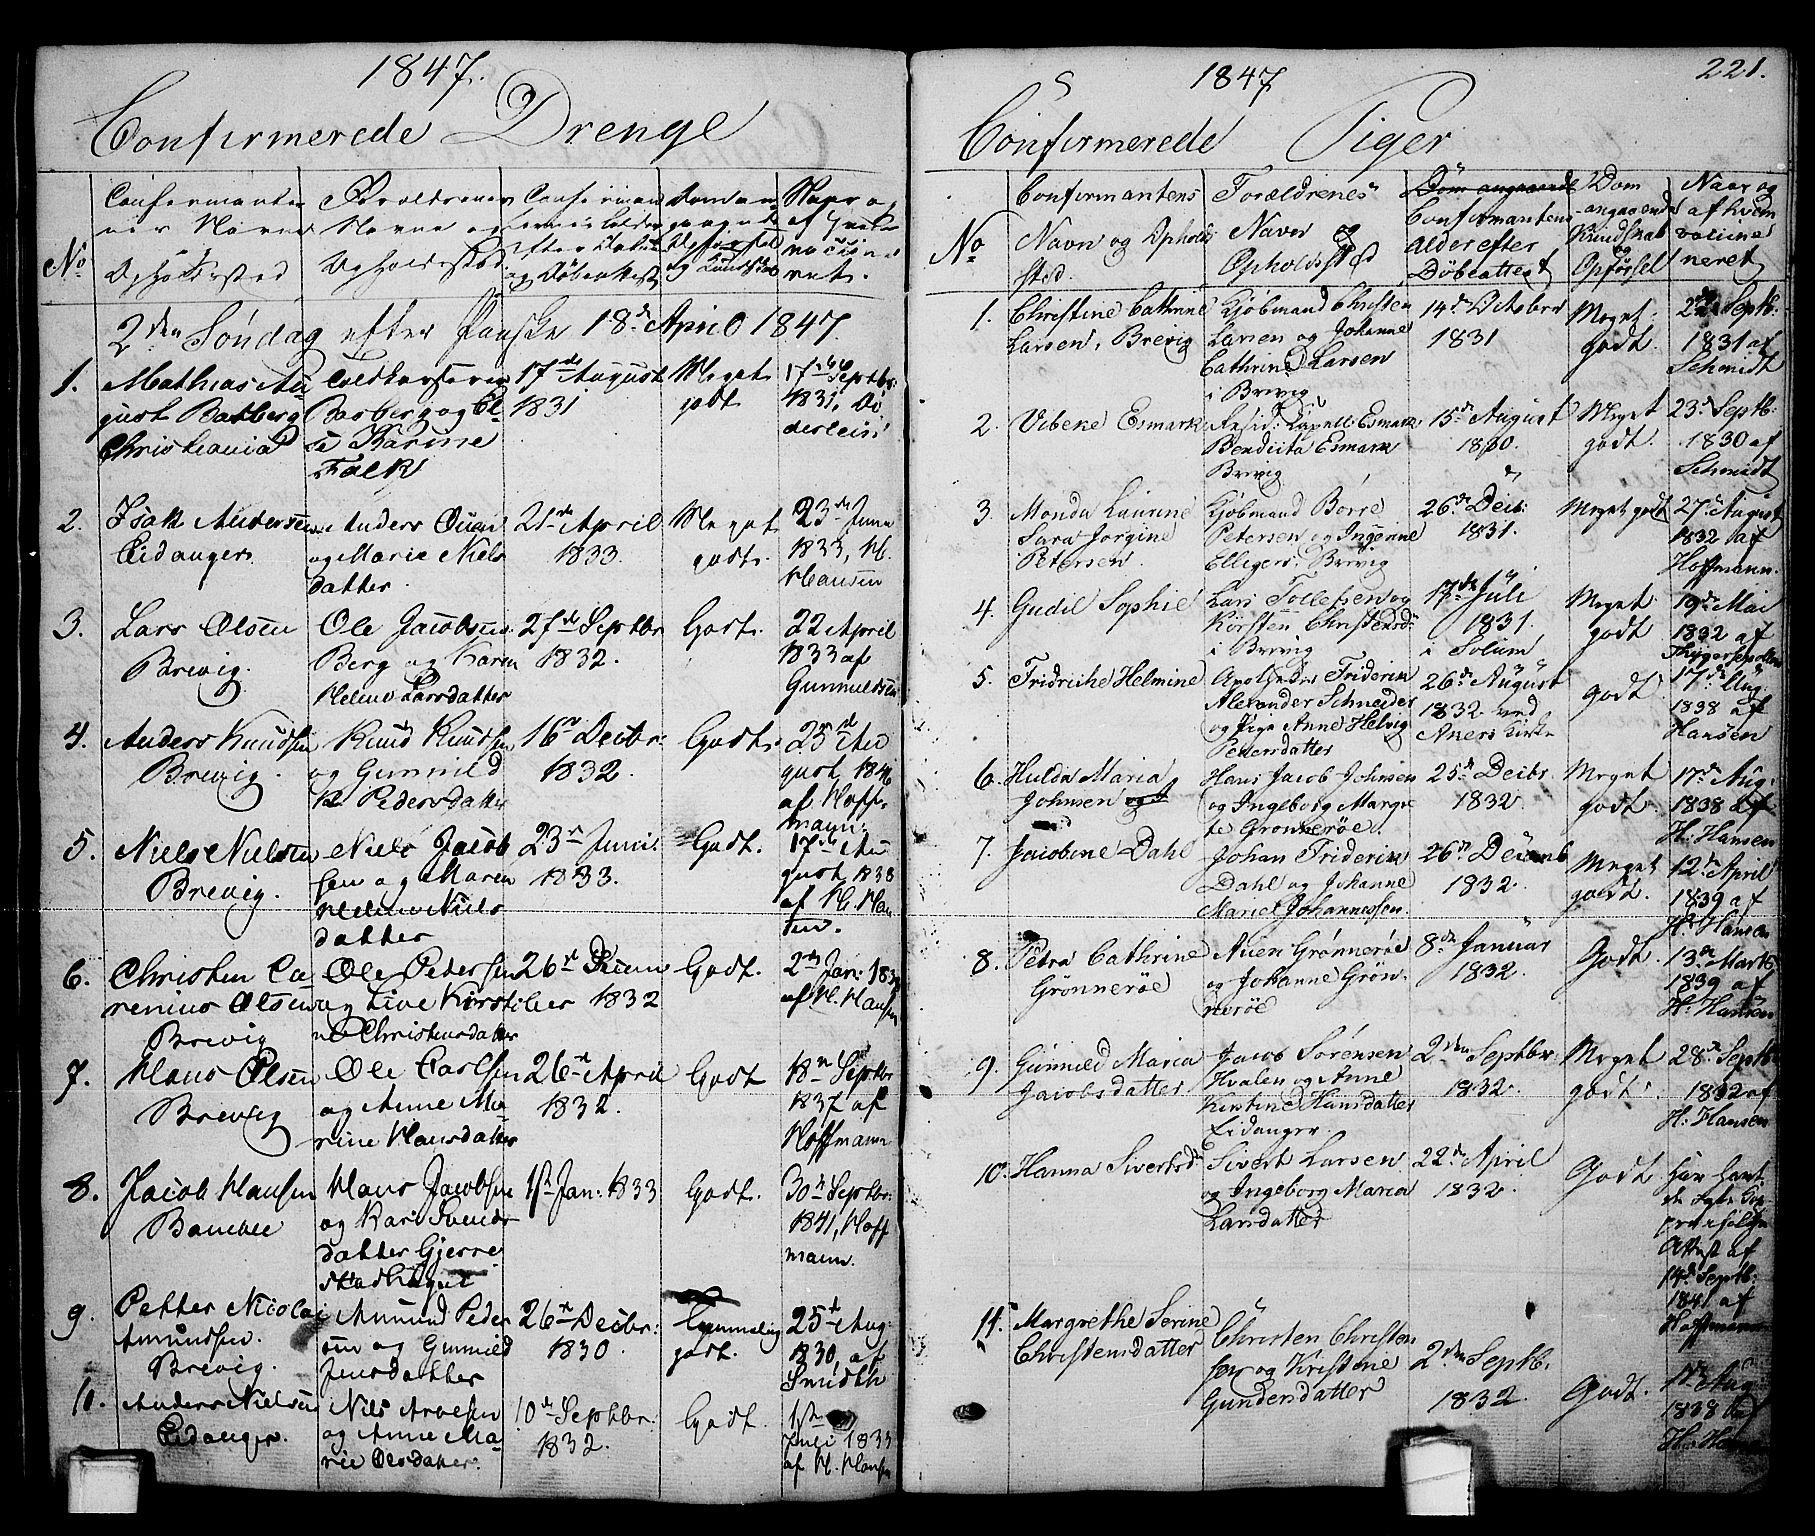 SAKO, Brevik kirkebøker, G/Ga/L0002: Klokkerbok nr. 2, 1846-1865, s. 221